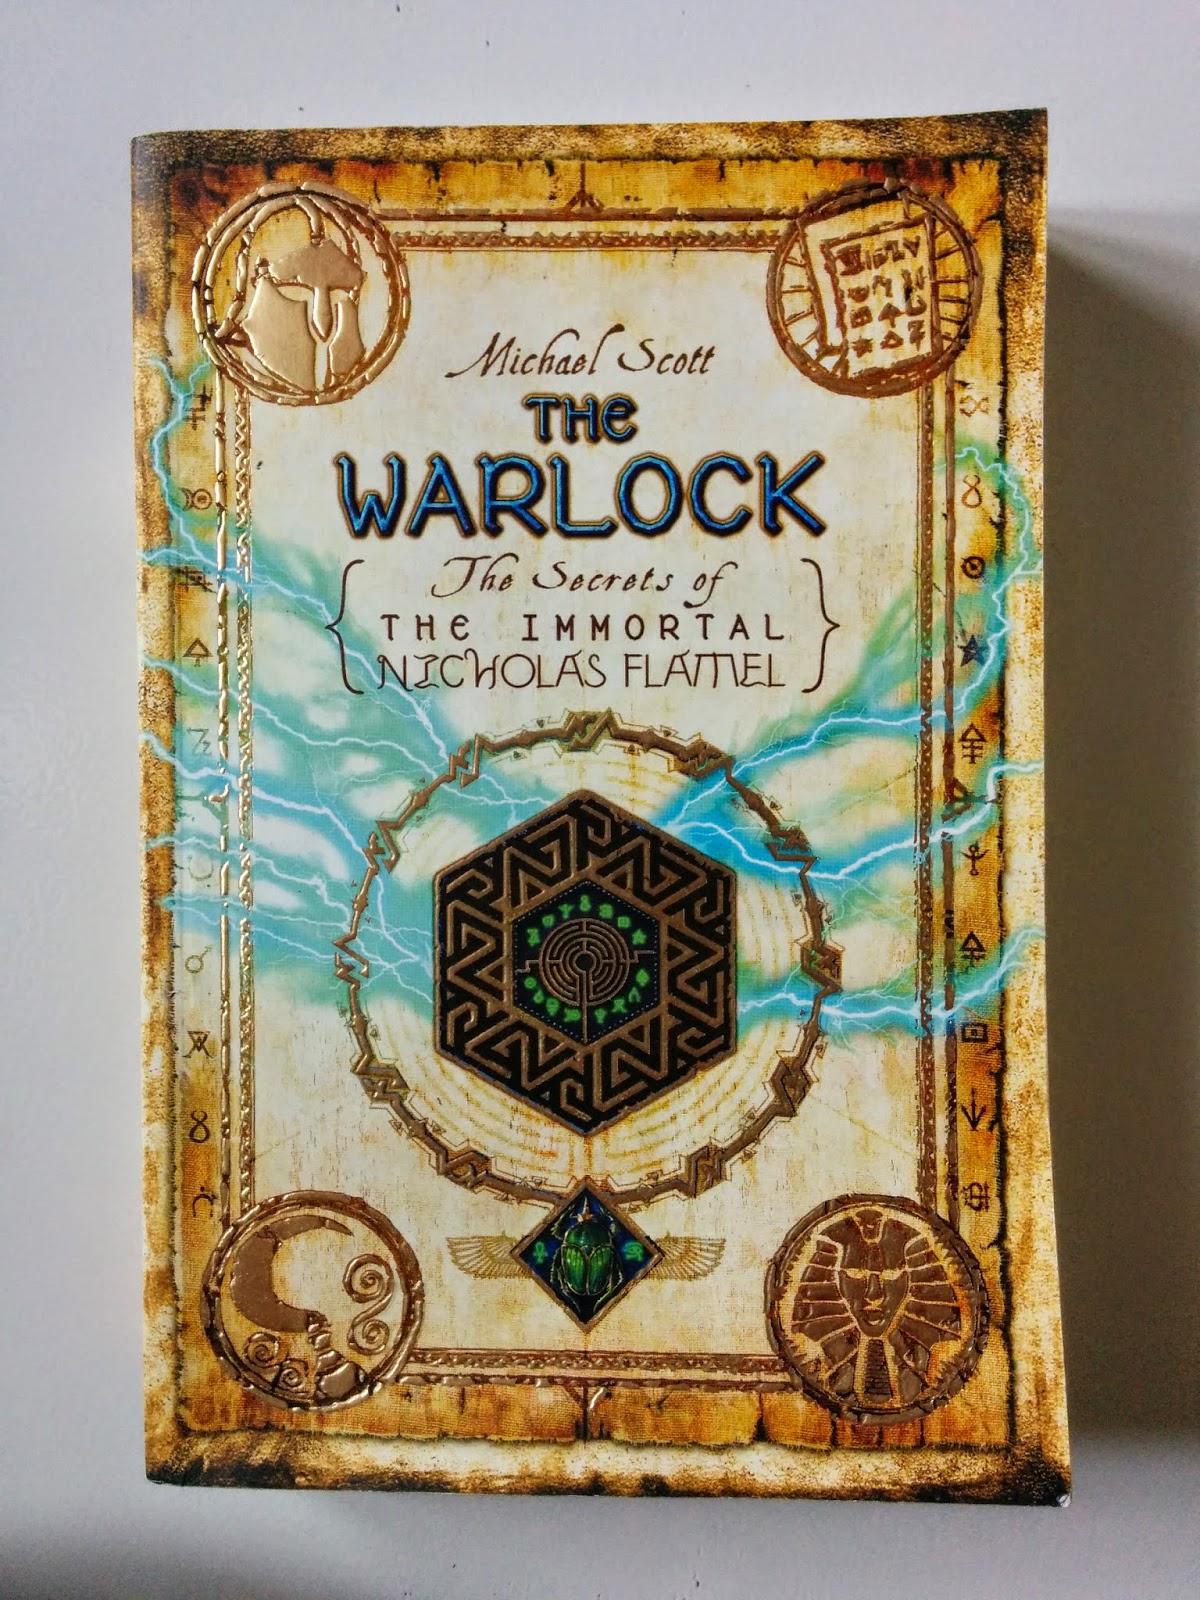 Jual Novel: The Warlock, The Secrets Of The Immortal Nicholas Flamel